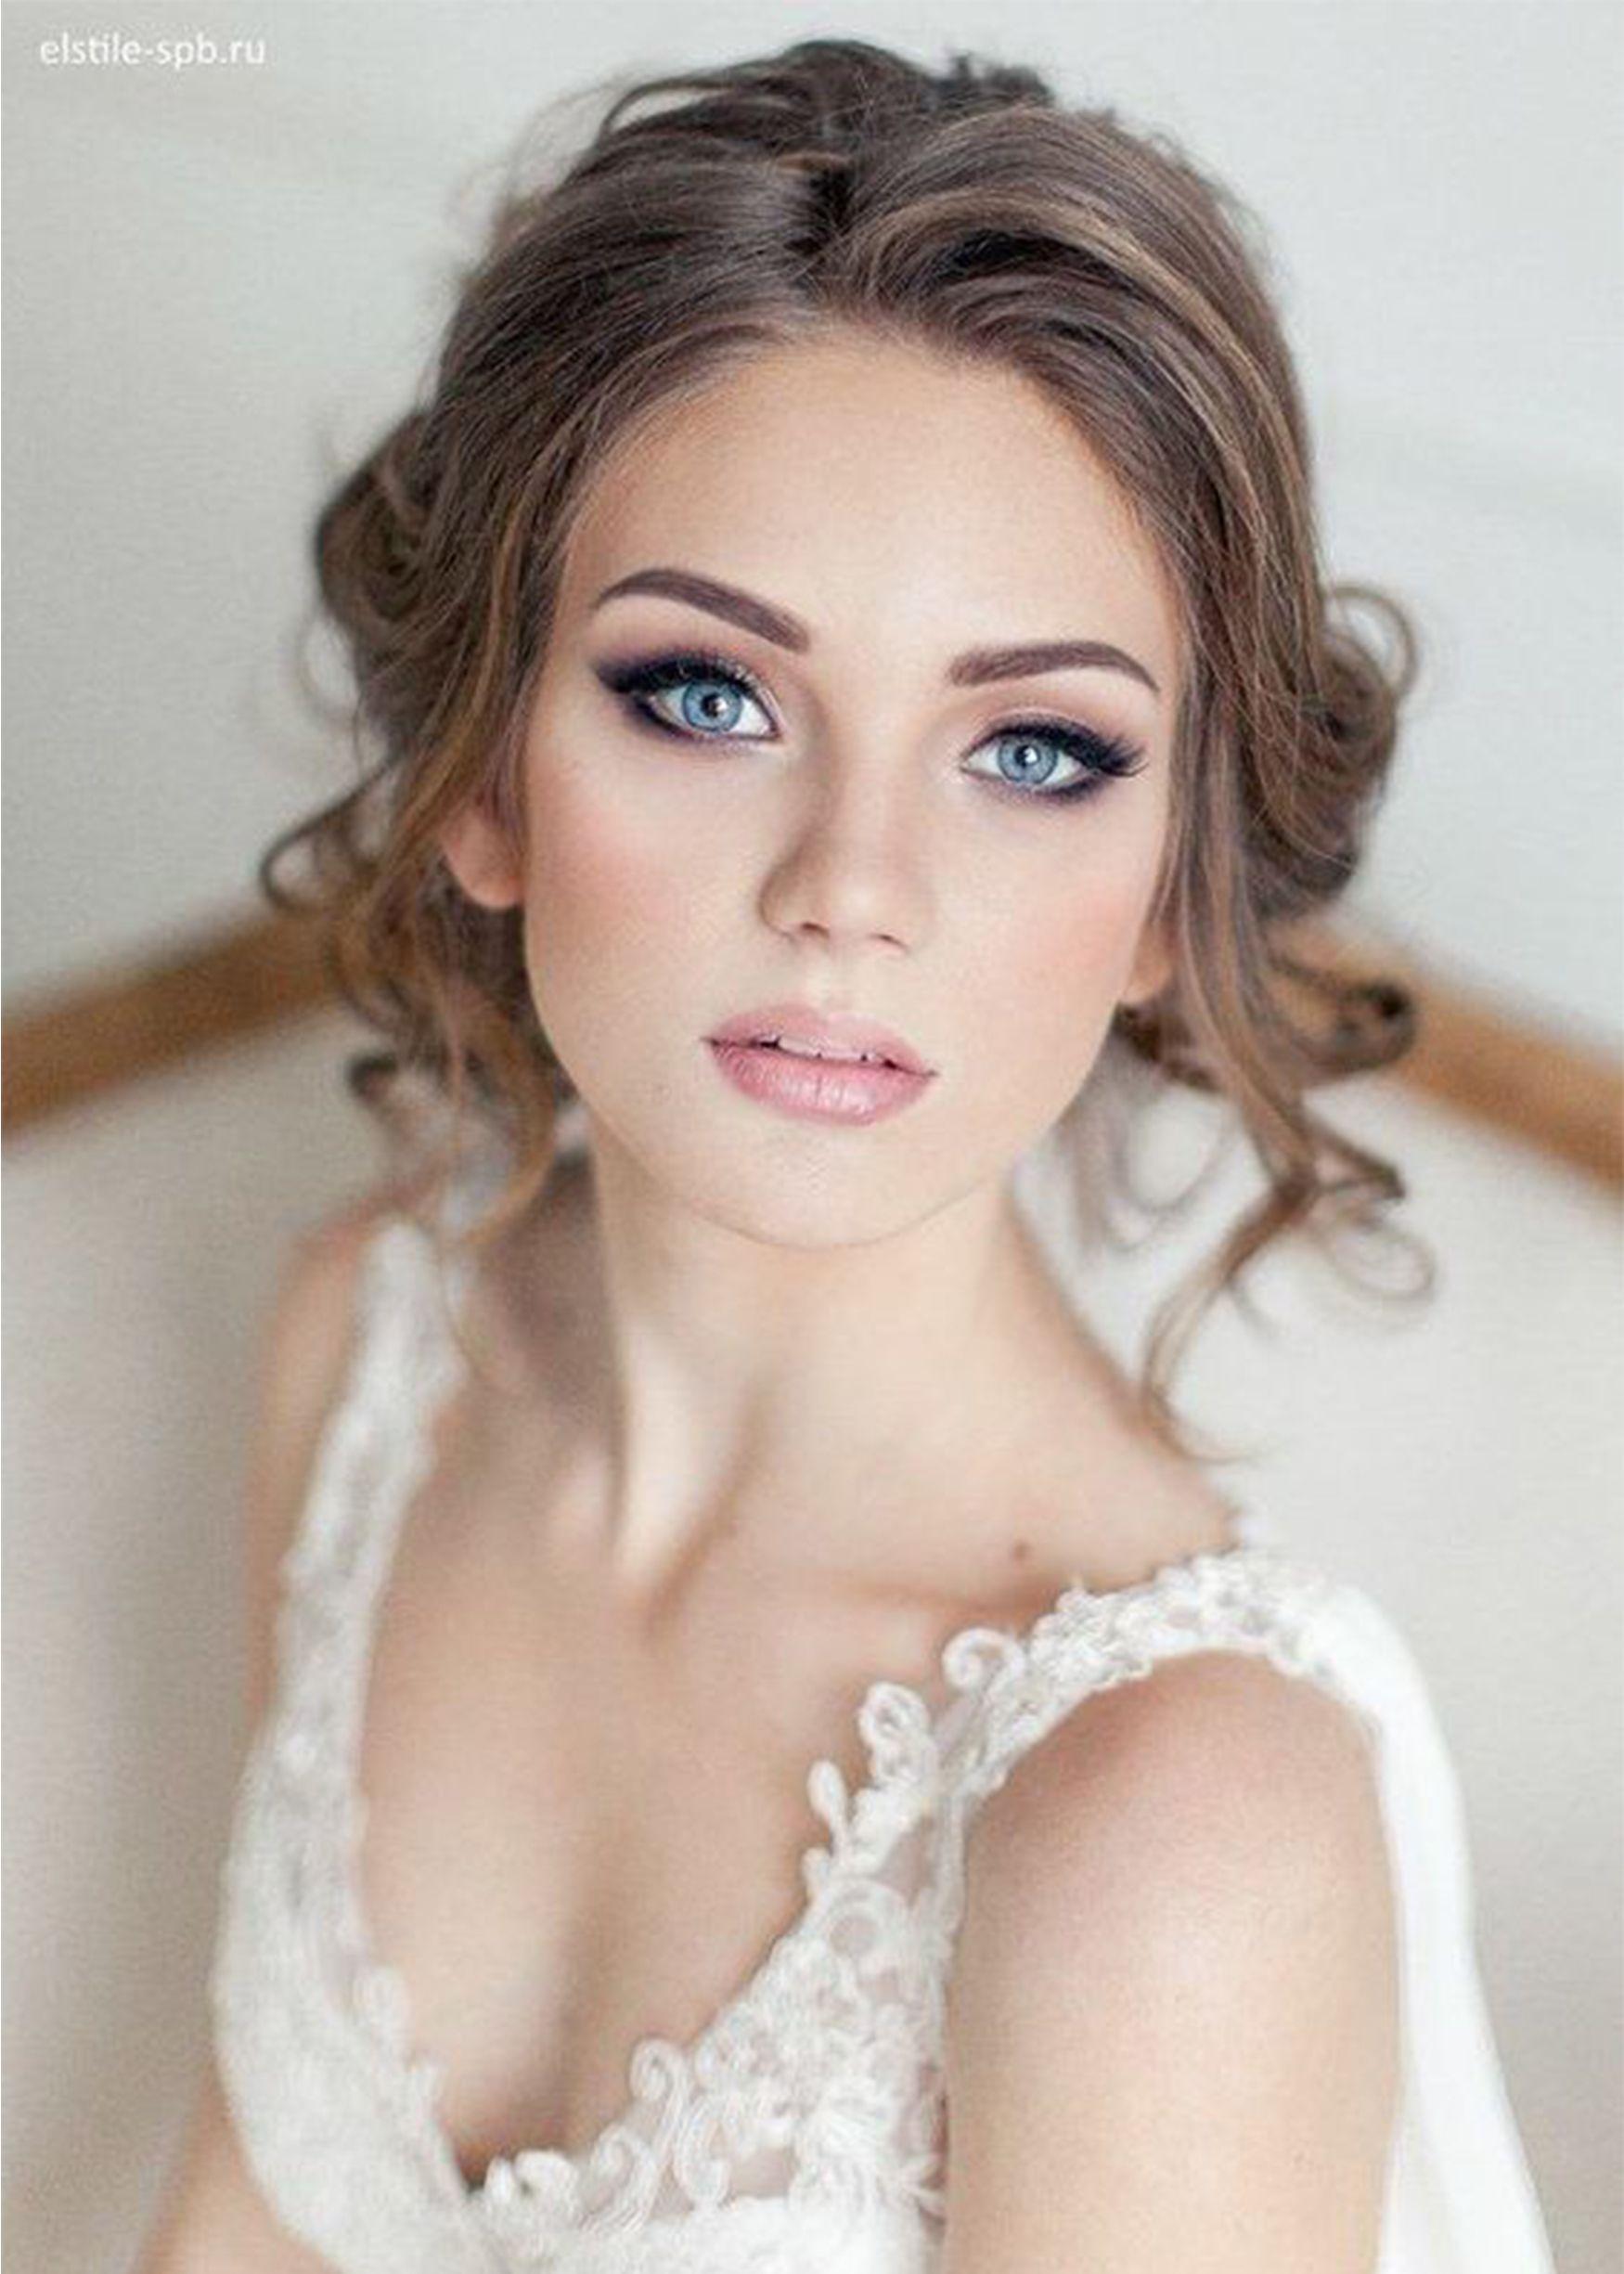 4 Bridal Makeup Looks In 2020 Gorgeous Wedding Makeup Wedding Makeup Looks Bride Makeup